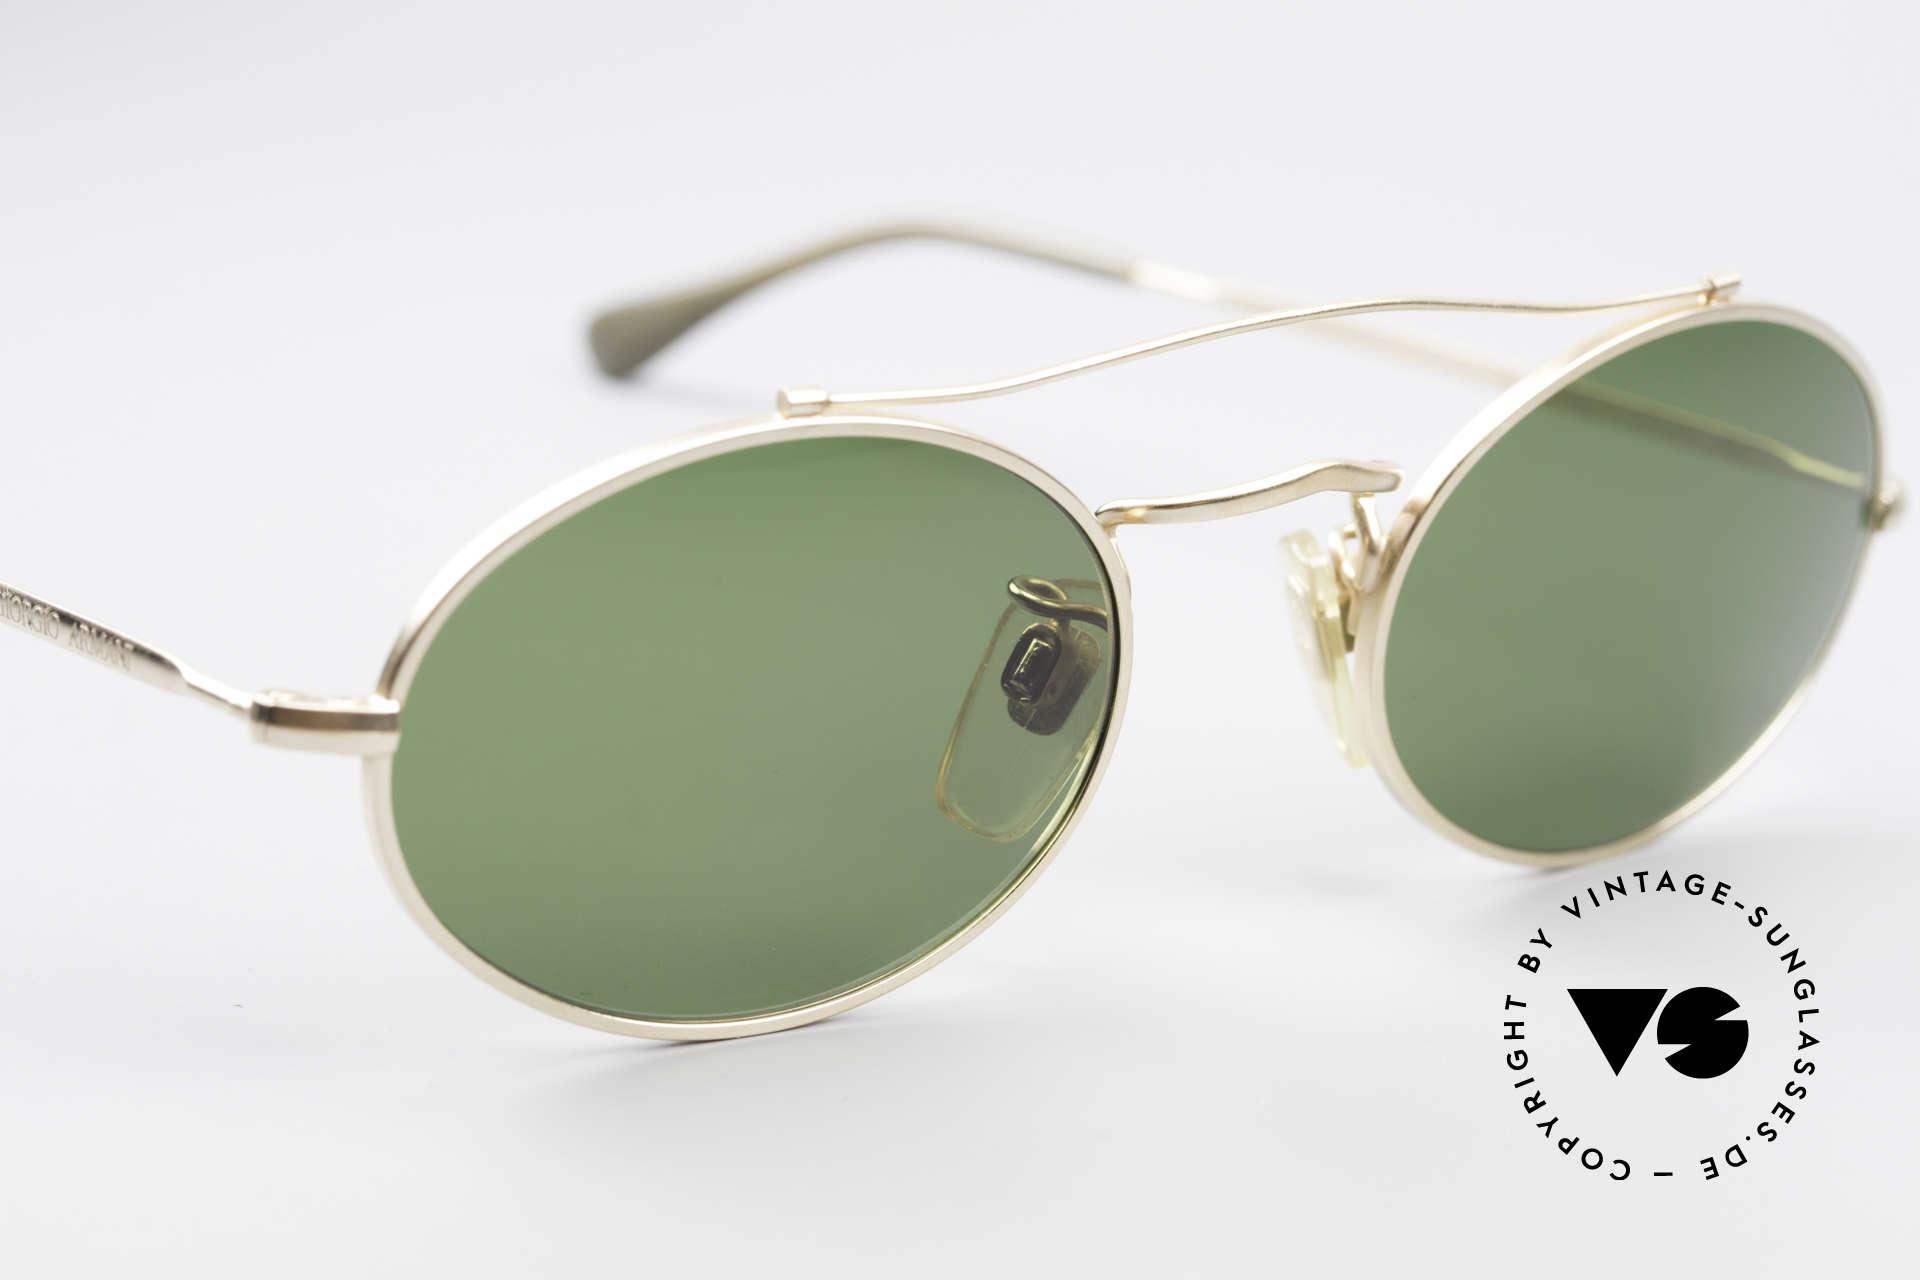 Giorgio Armani 115 90's Designer Sunglasses, NO RETRO GLASSES, but an old original from 1990, Made for Men and Women